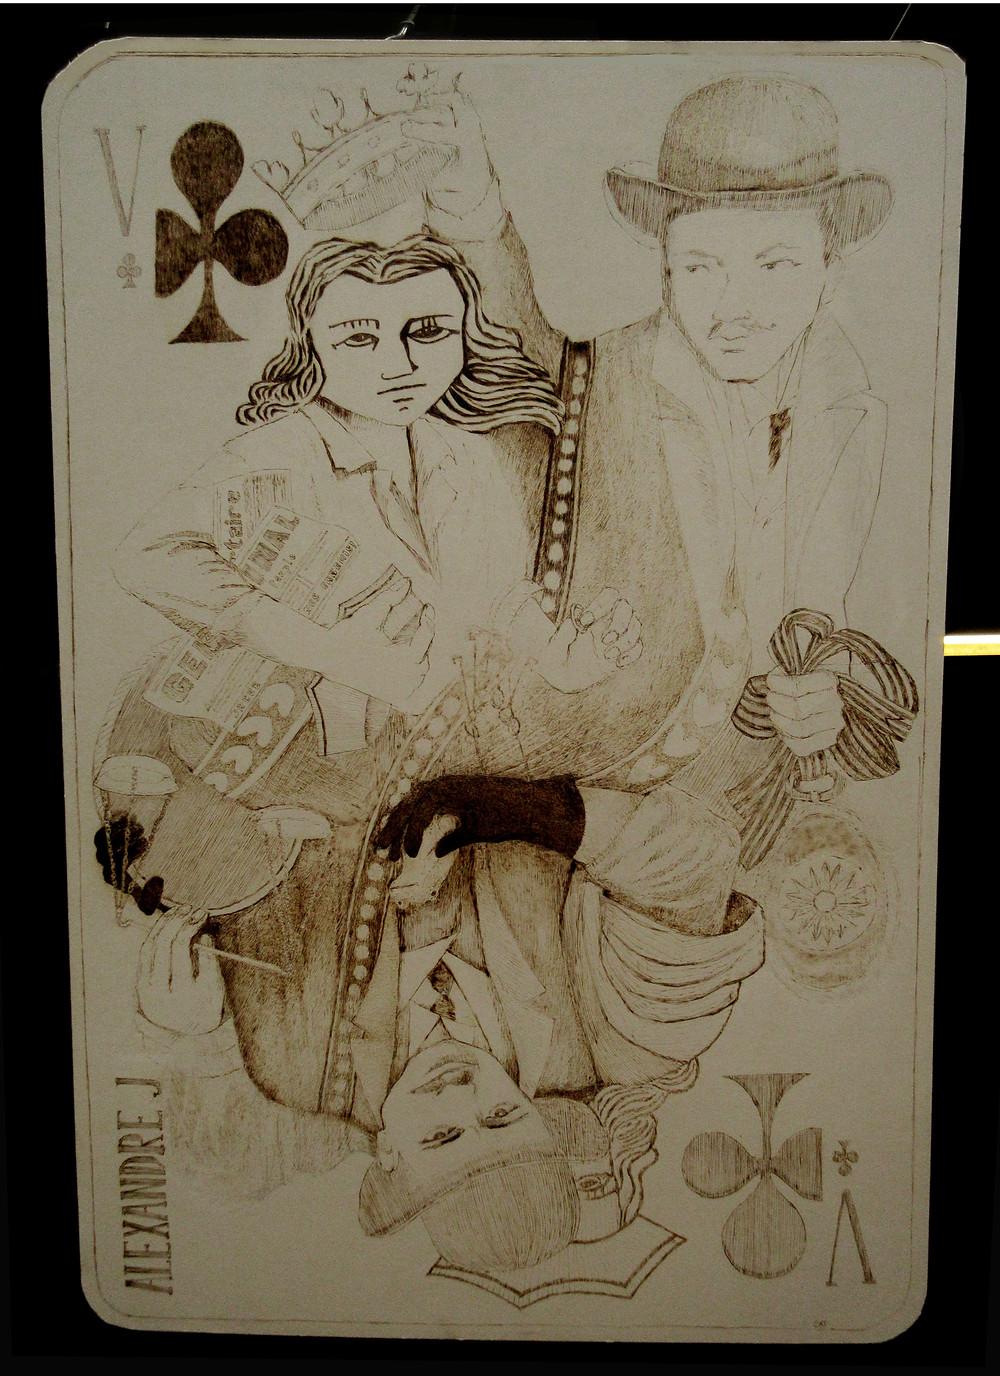 Alexandre J. pyrogravure sur carton 100x65cm 2019 Catherine OLIVIER